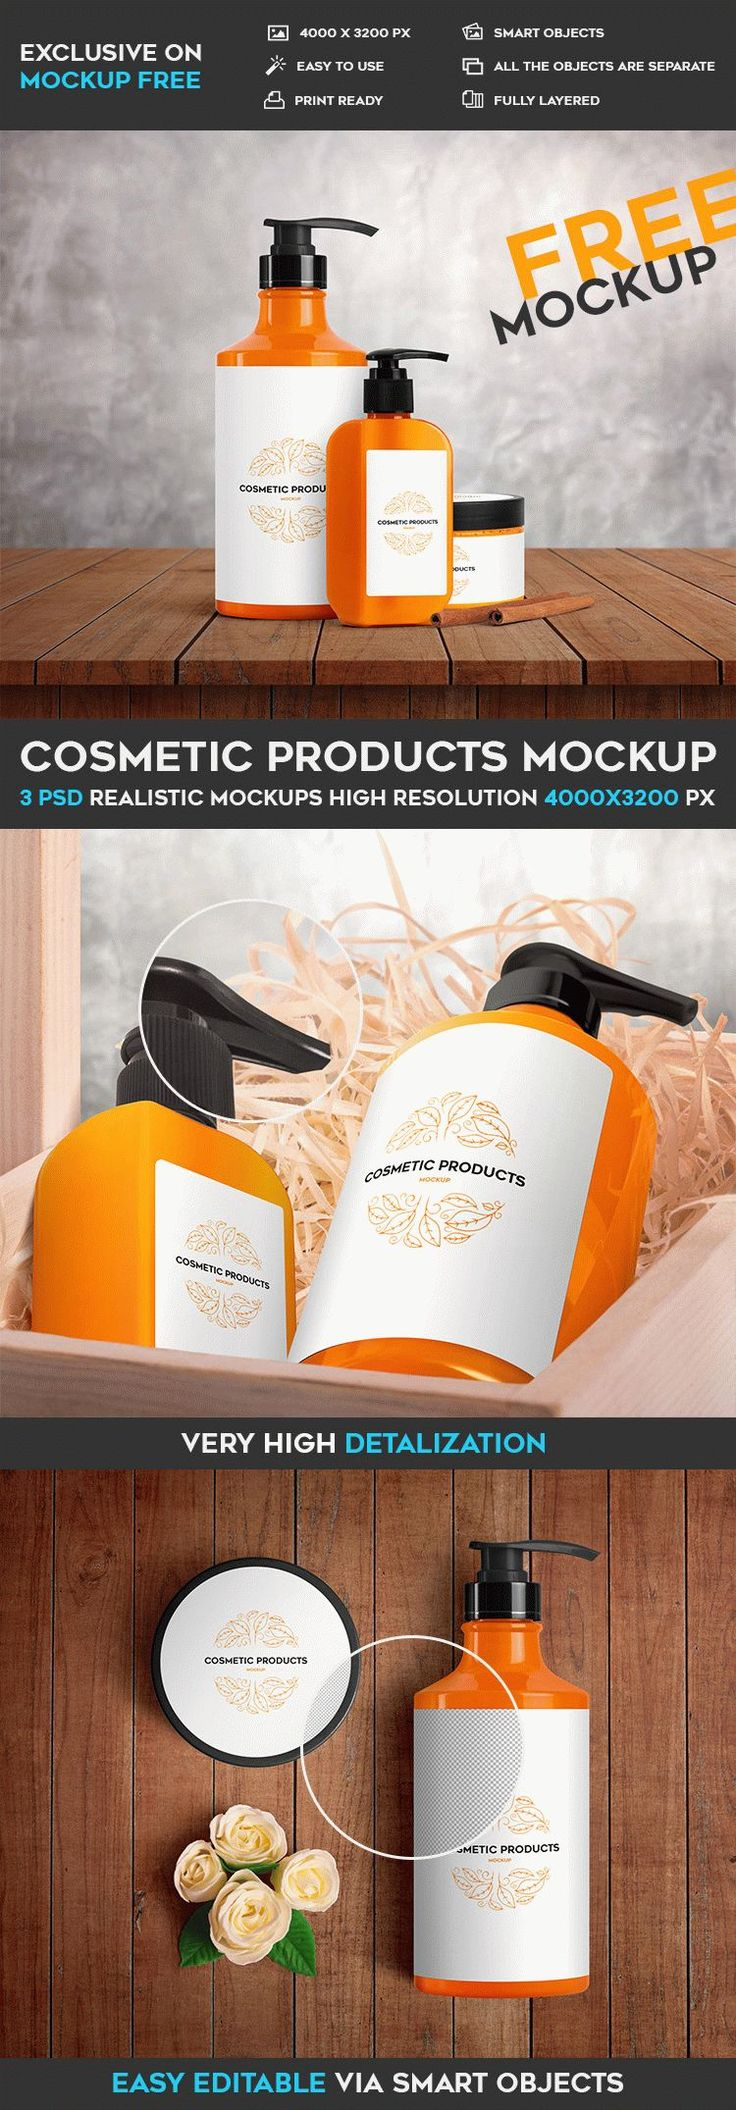 Cosmetic Products Free Psd Mockup Mockupfree Co Mockup Free Psd Mockup Psd Design Mockup Free